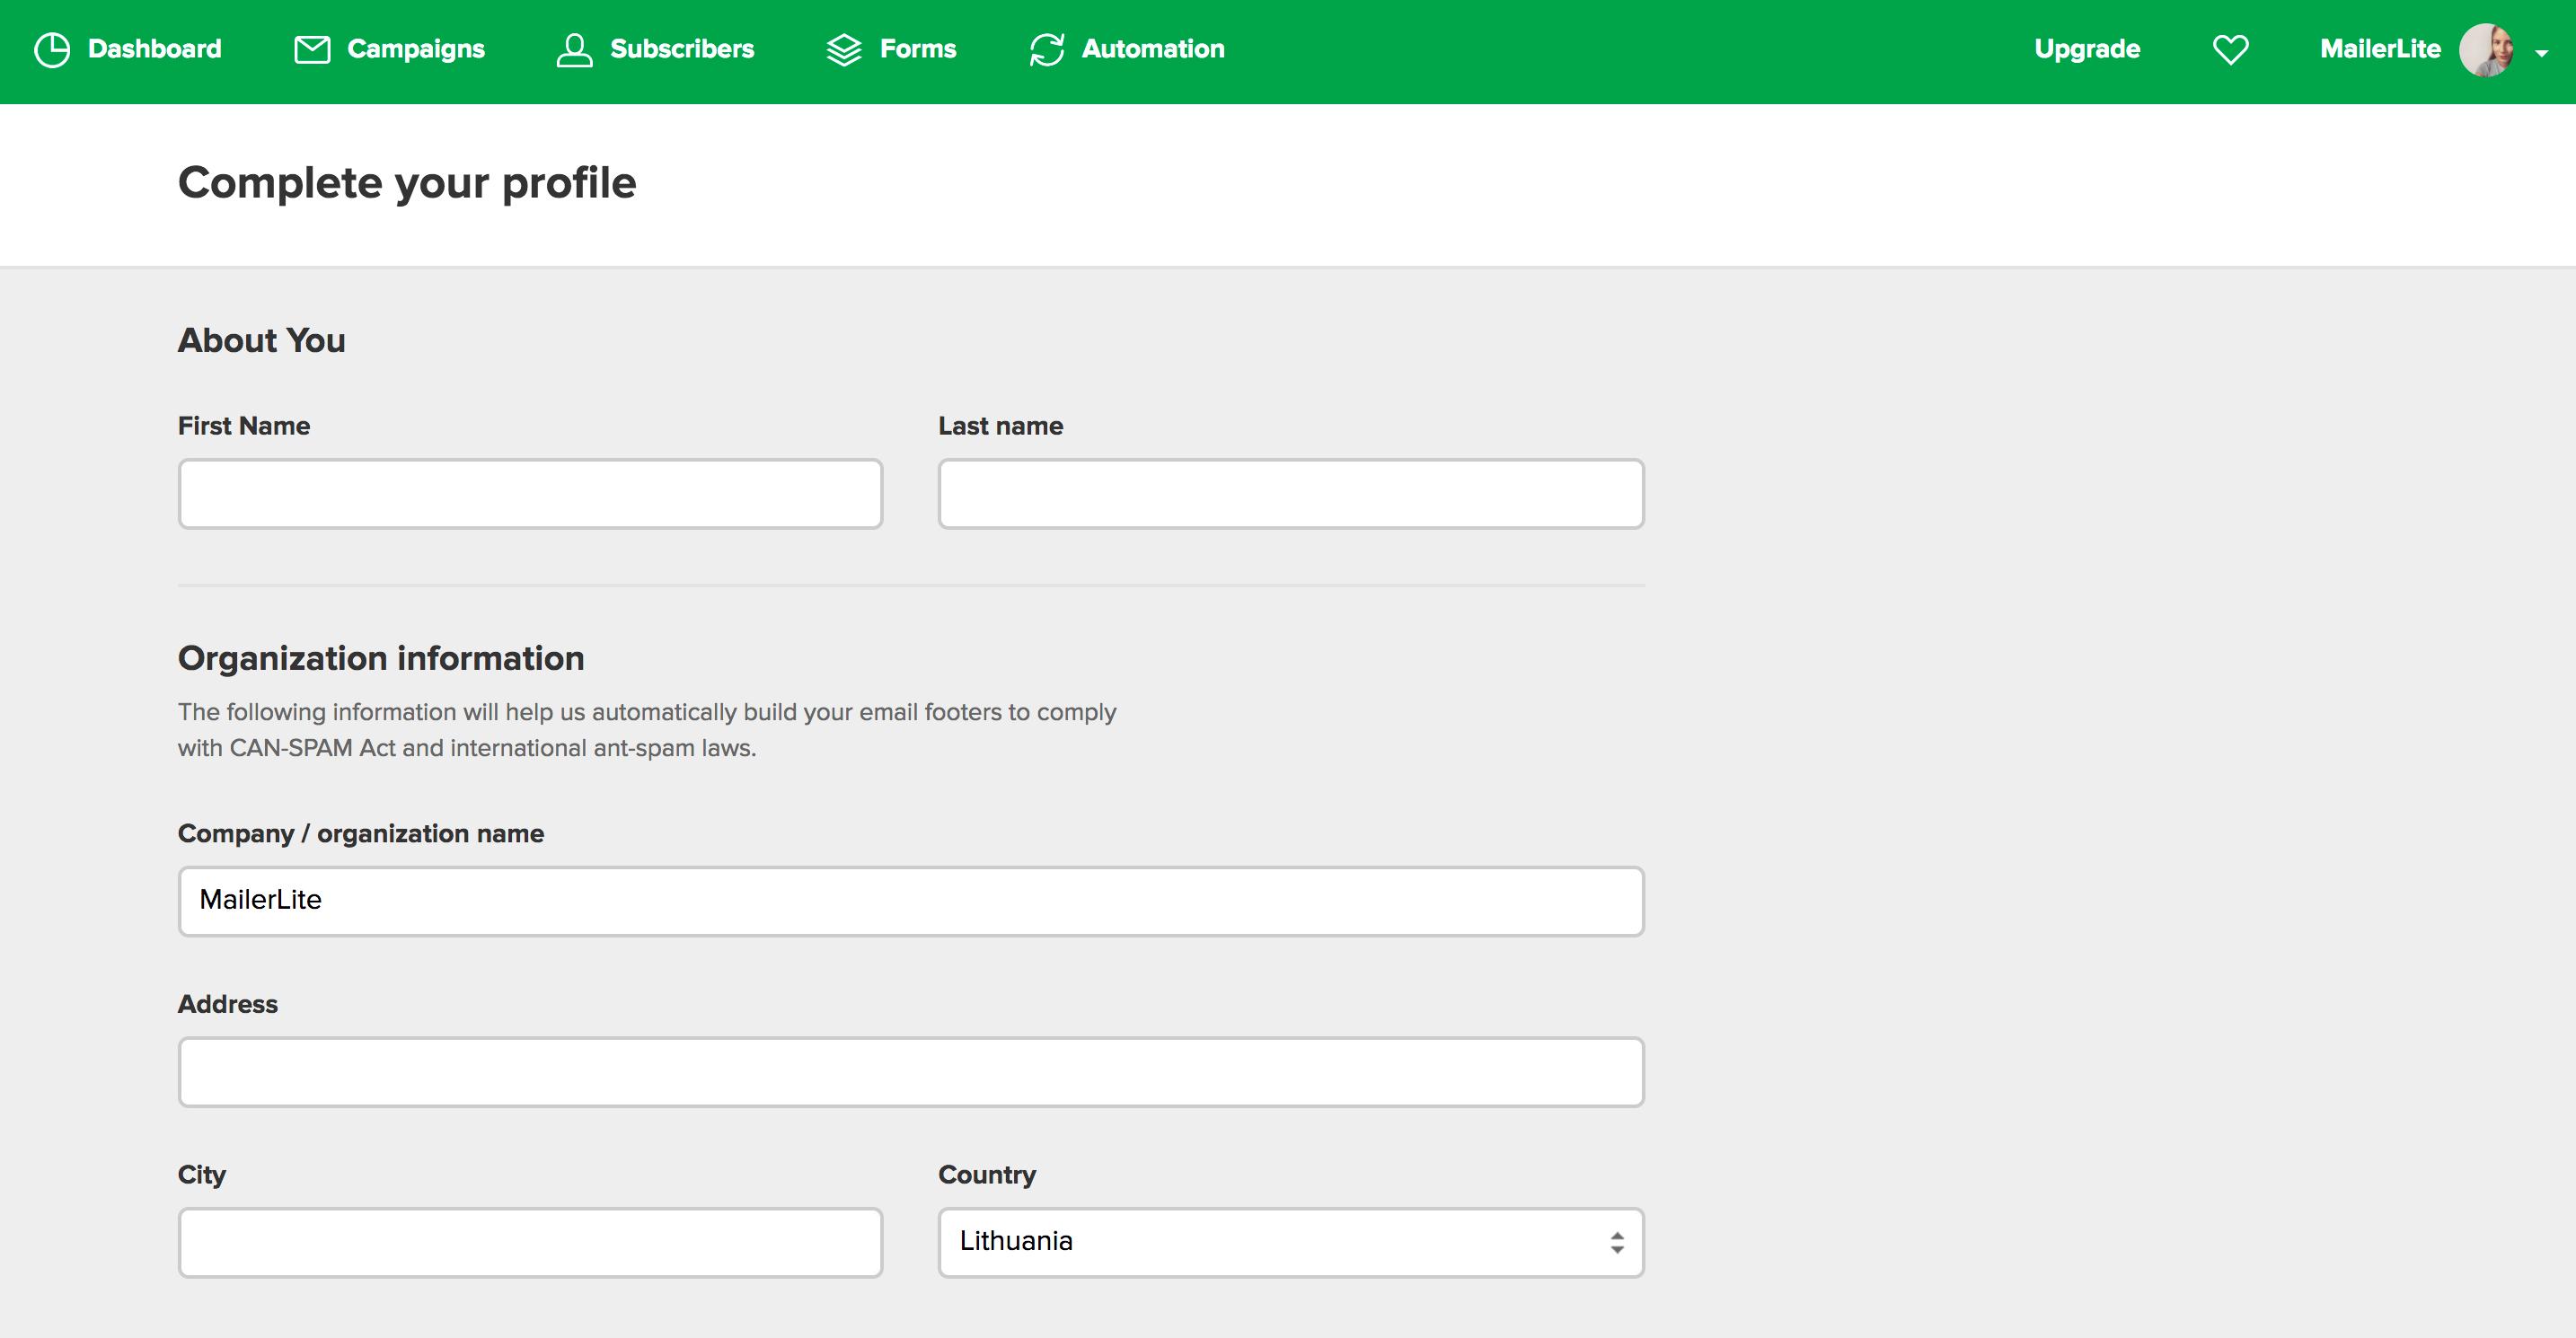 mailerLite profile